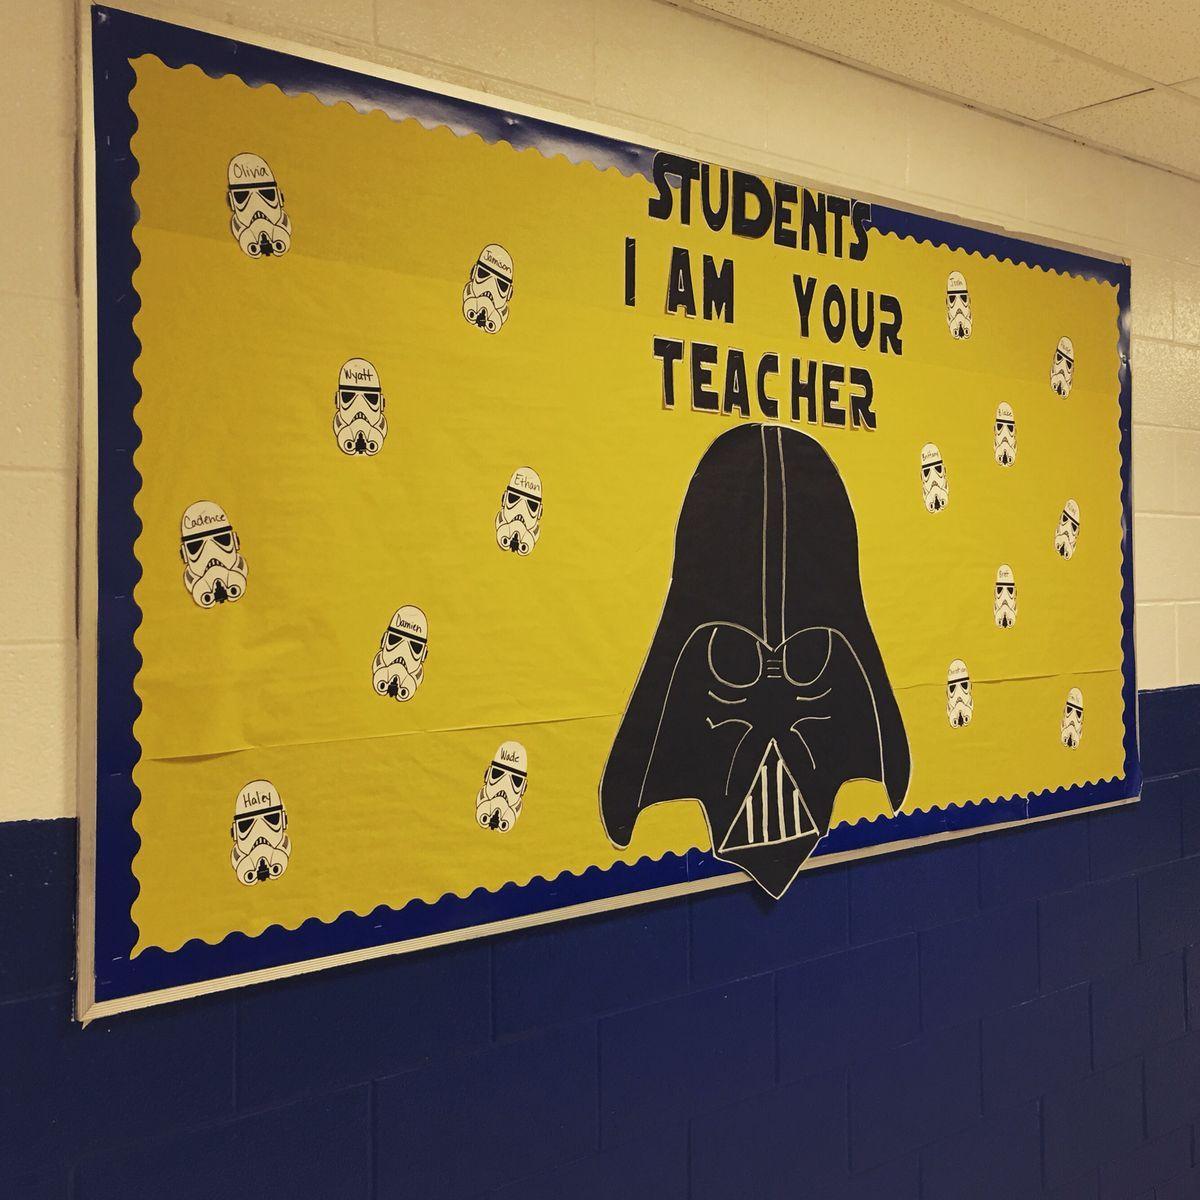 Pin by Cristy on Fourth Grade | Pinterest | Bulletin board, Board ...